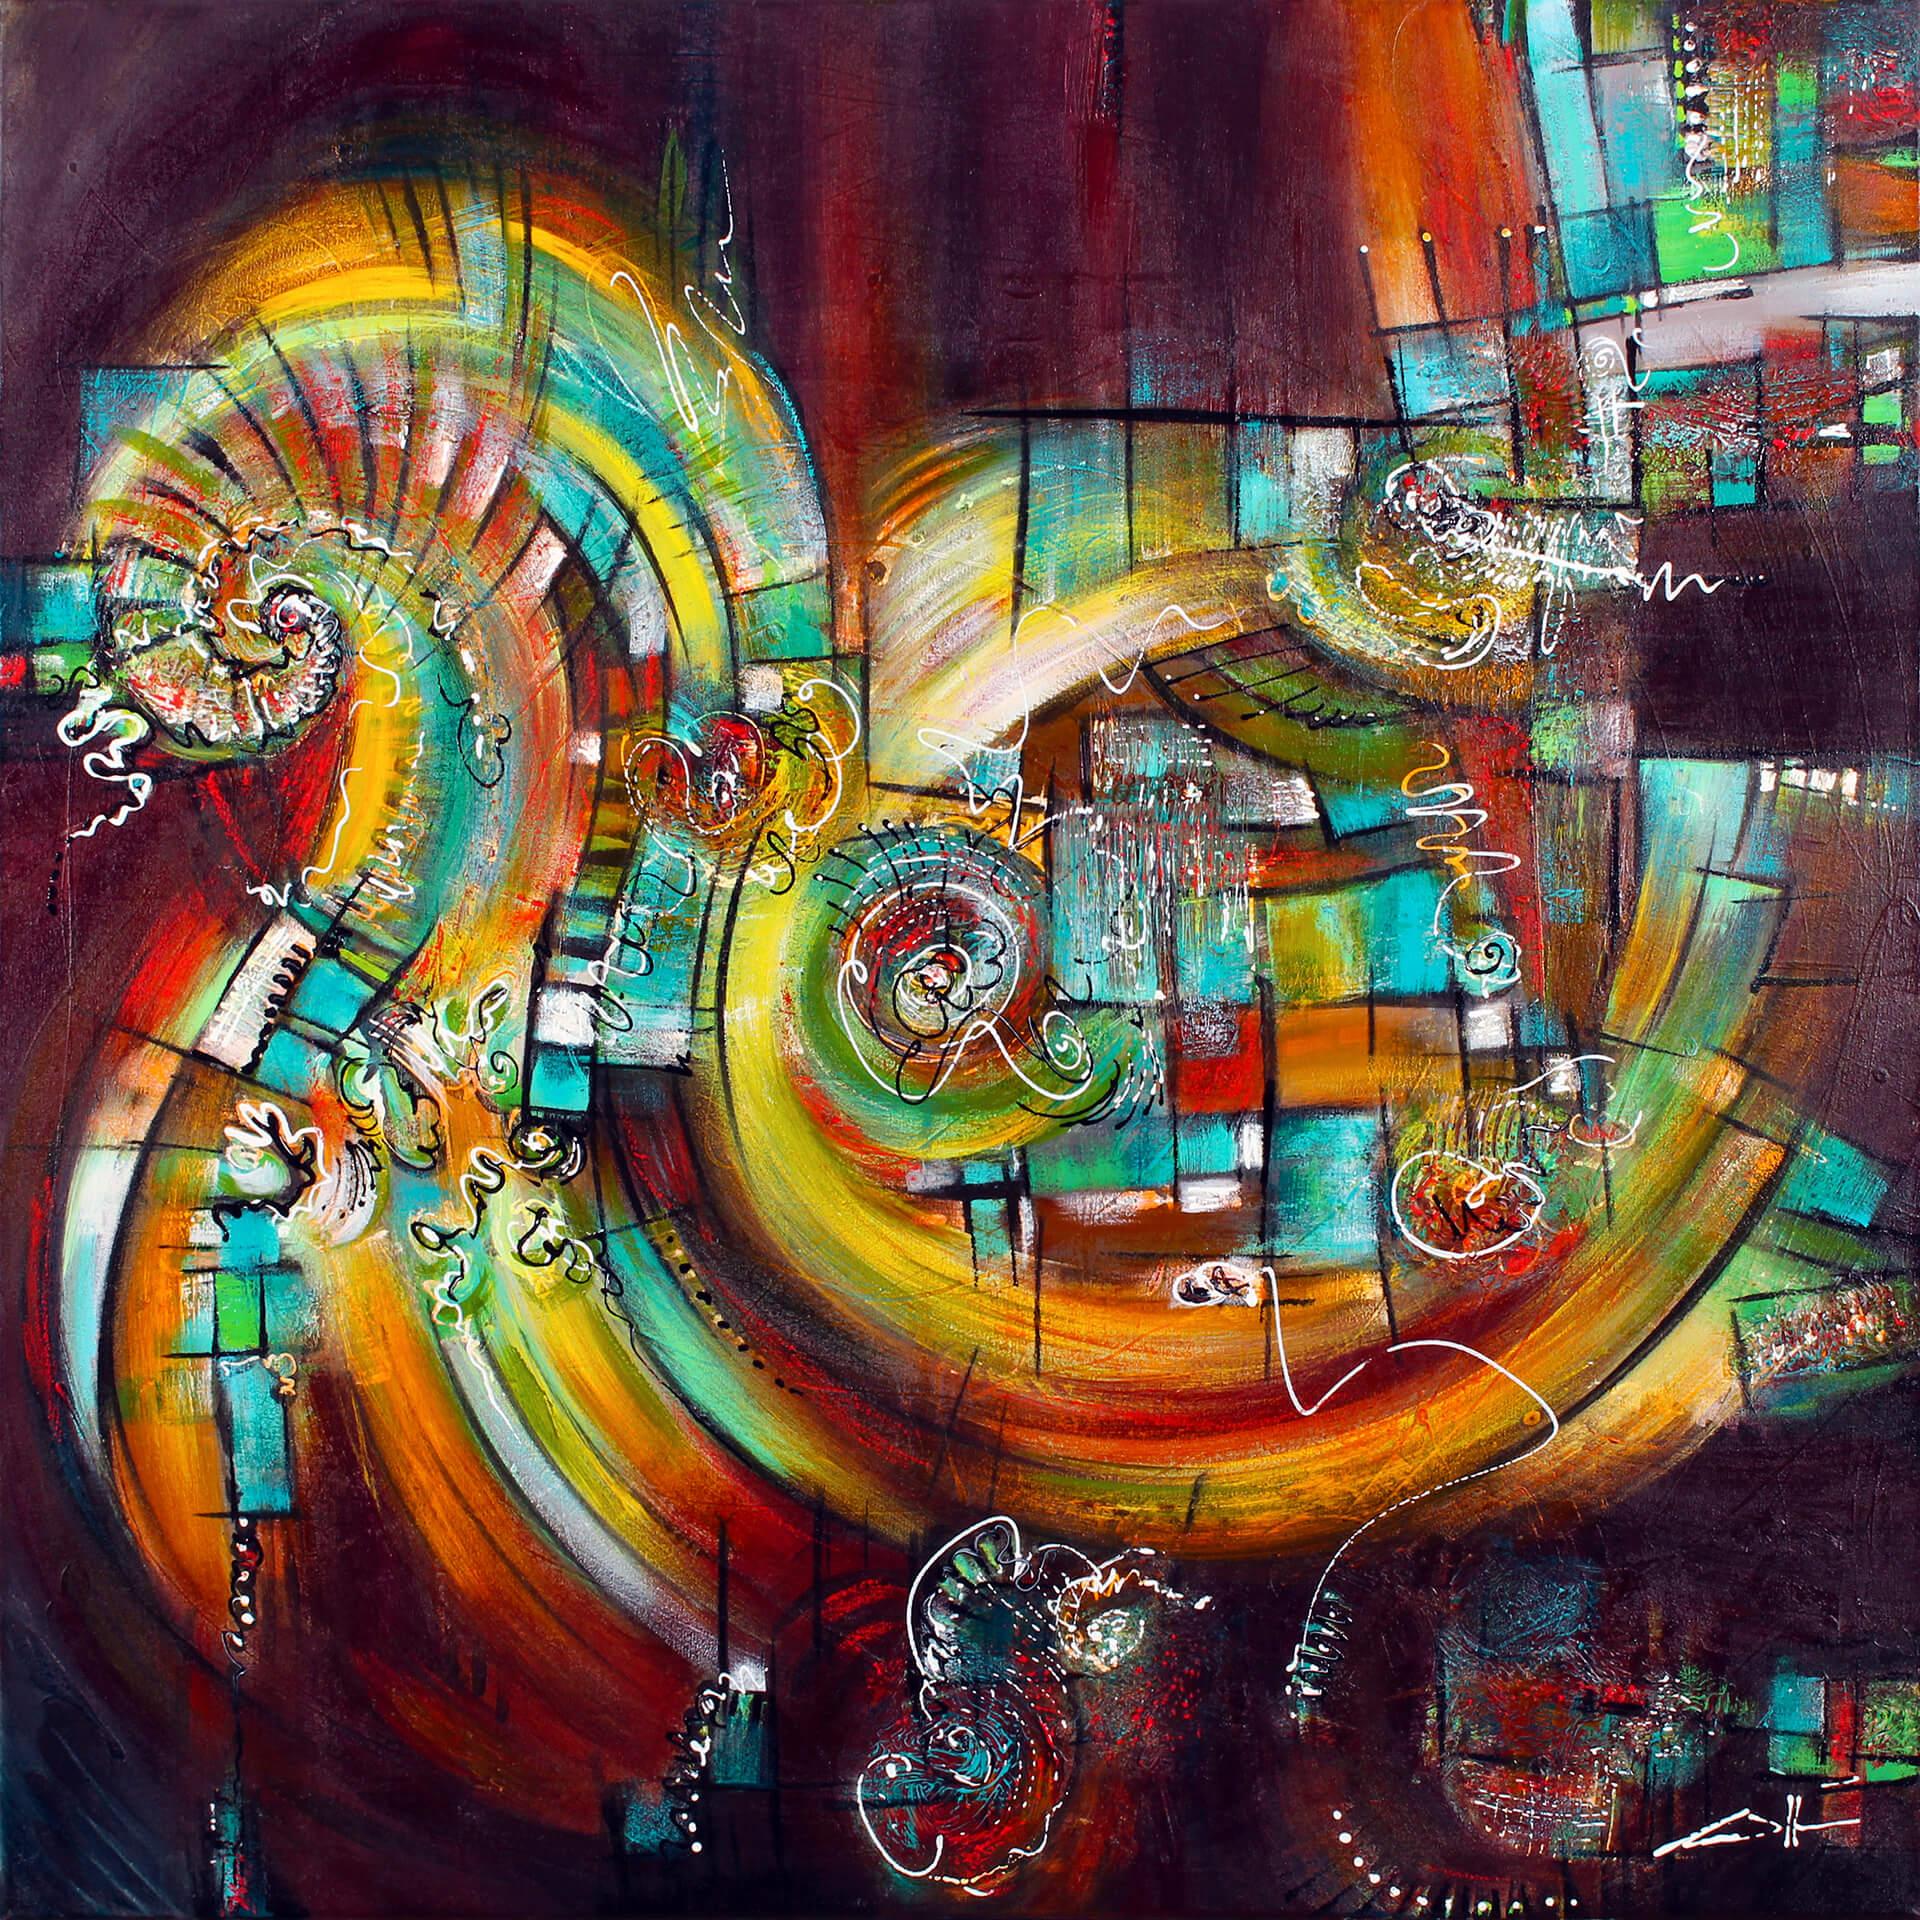 art-eric-j-hughes-artiste-peintre-canadien-tableau-symbiose-drakkar